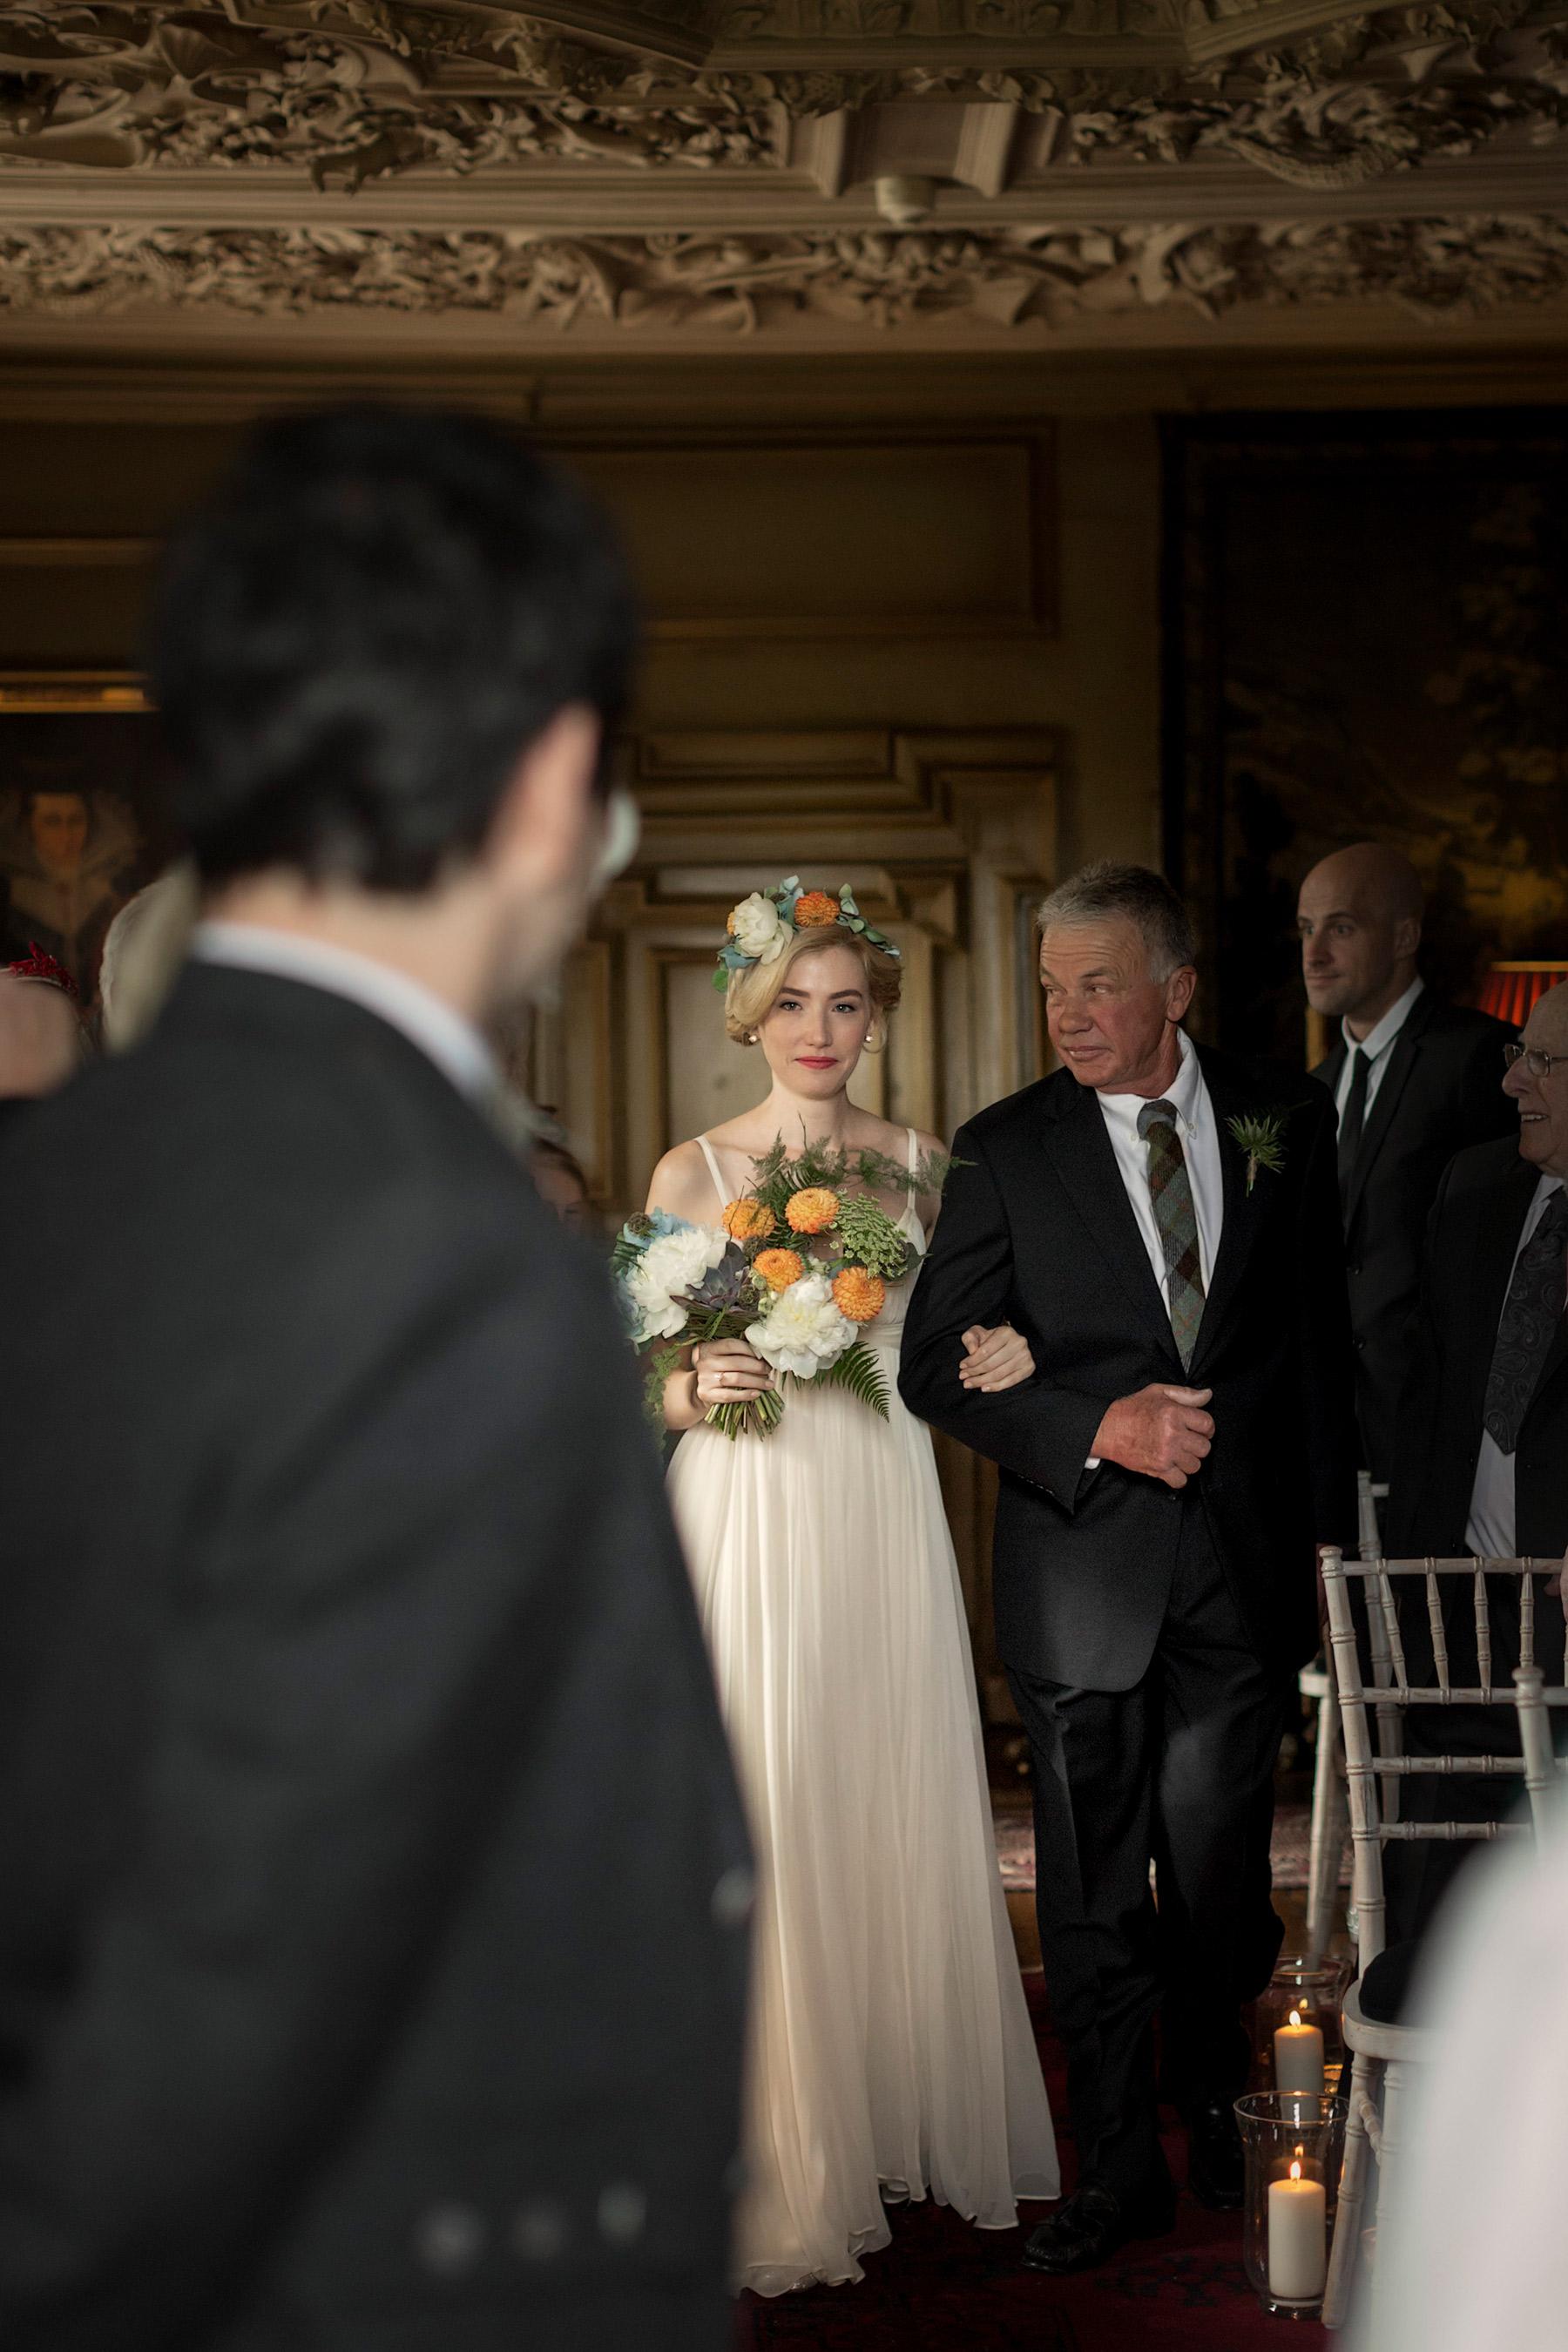 stuart mcLeod's wedding in scotland